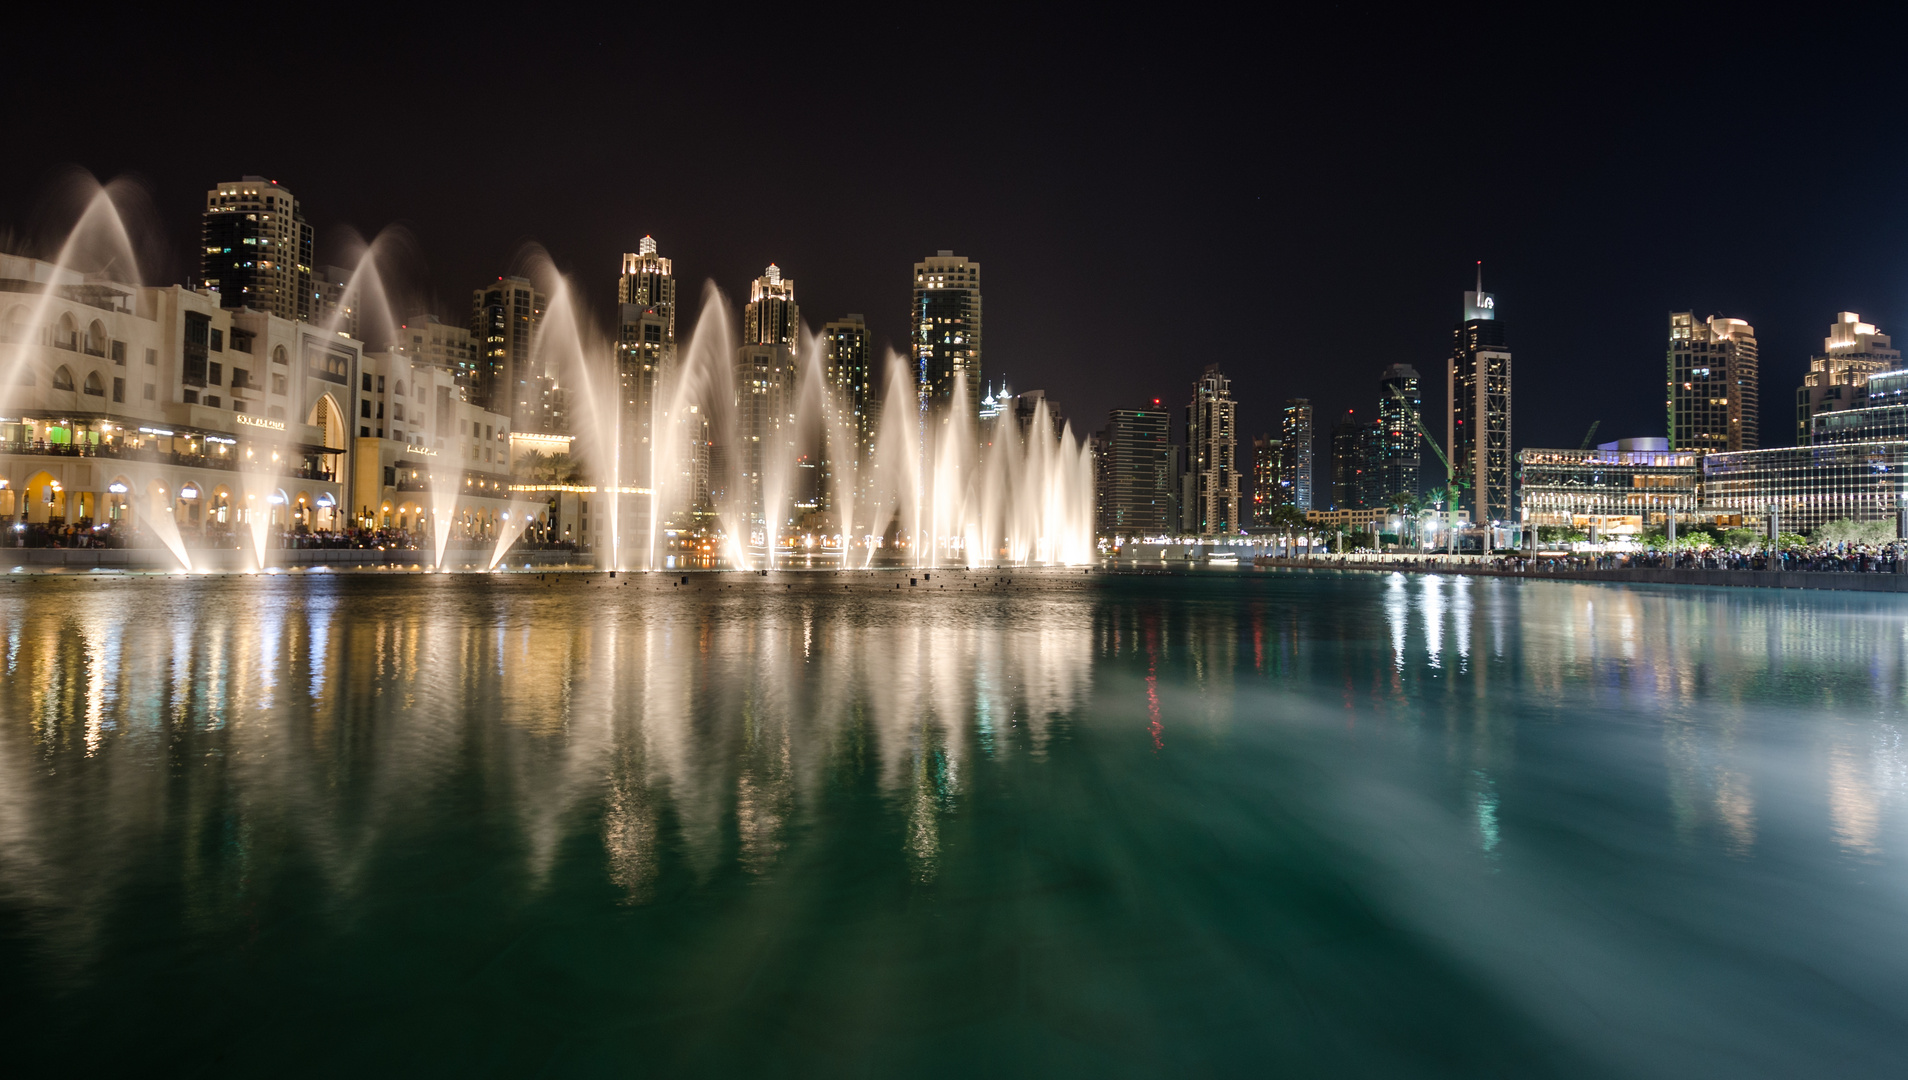 Dubai Fountain Lake bei Nacht